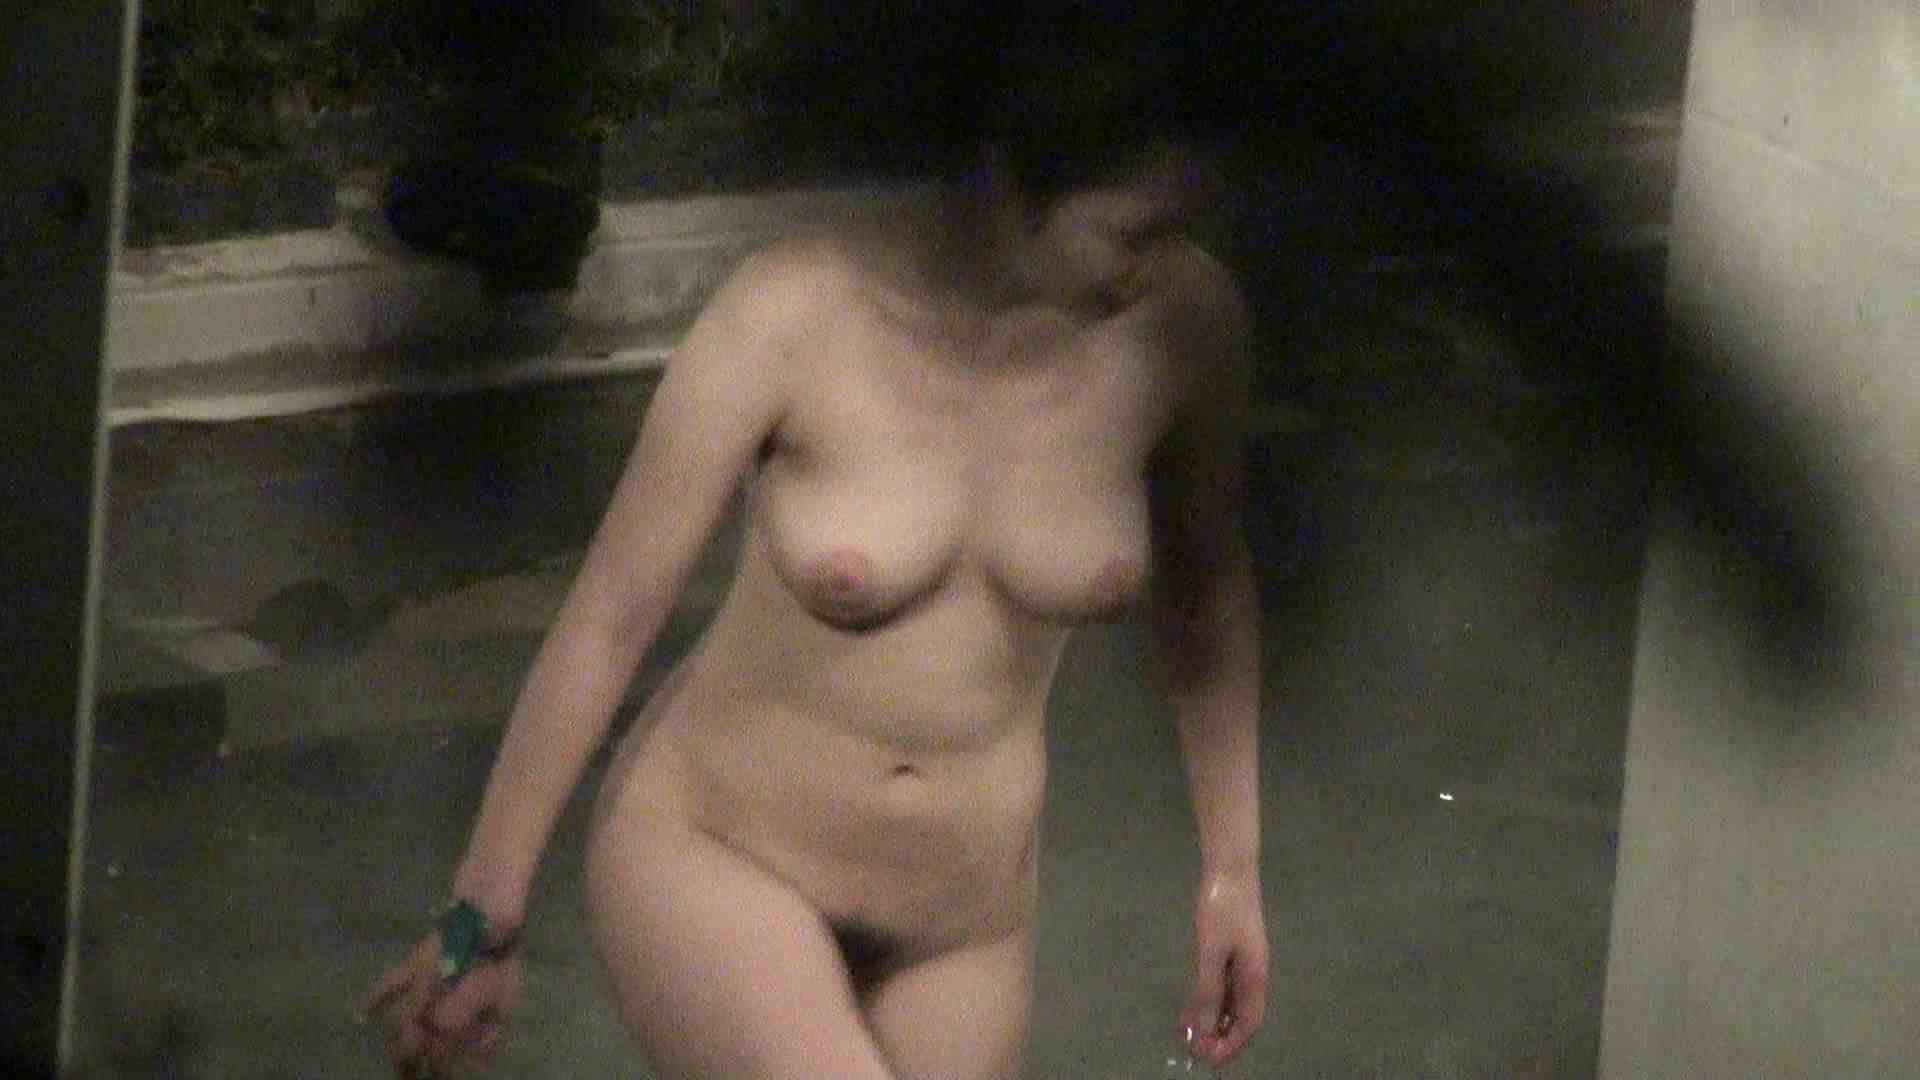 Aquaな露天風呂Vol.365 OL女体  72連発 15